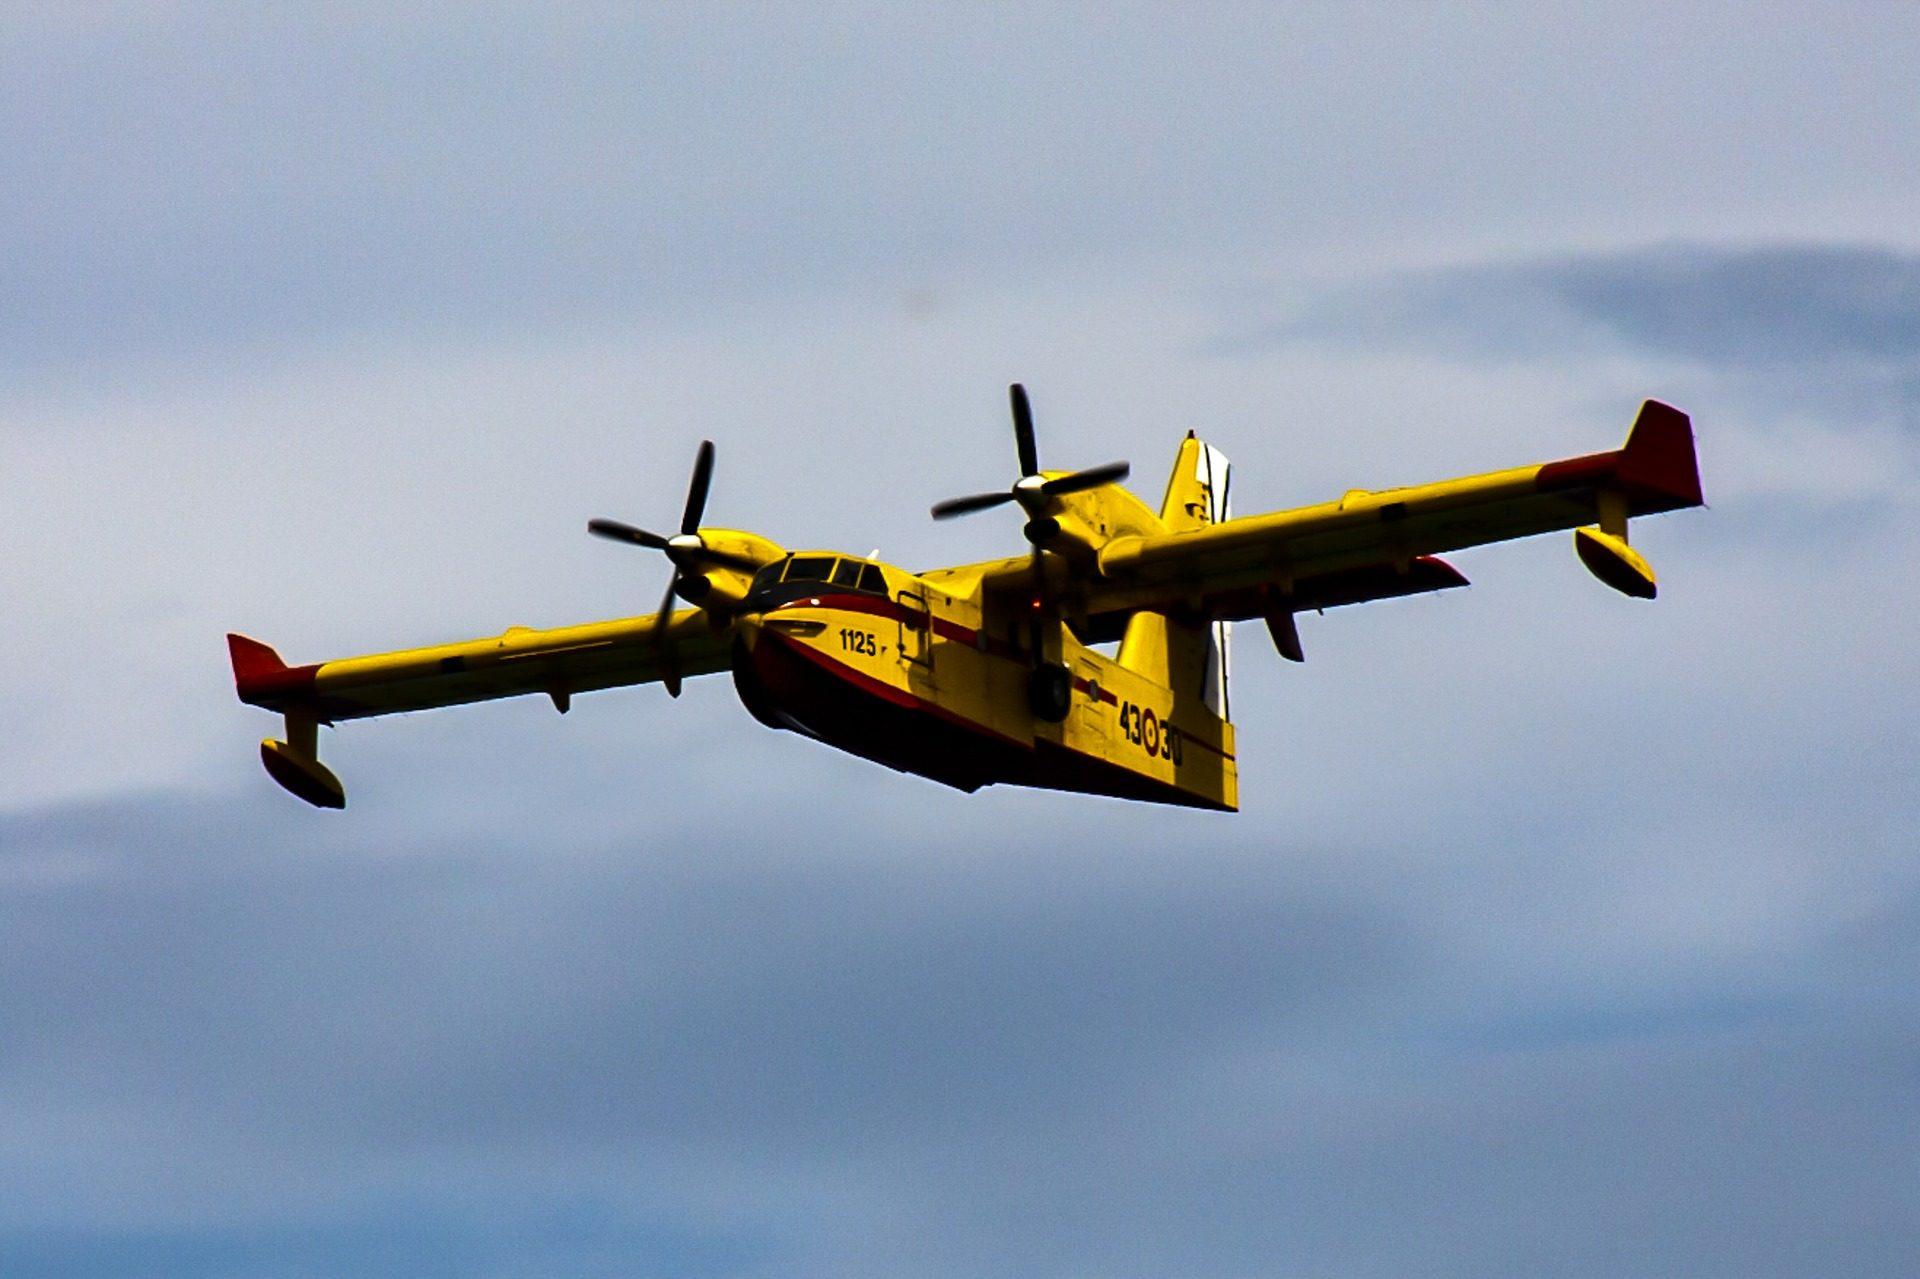 Avión, aeroplano, cisterna, idrovolante, aeromobili, contingente - Sfondi HD - Professor-falken.com